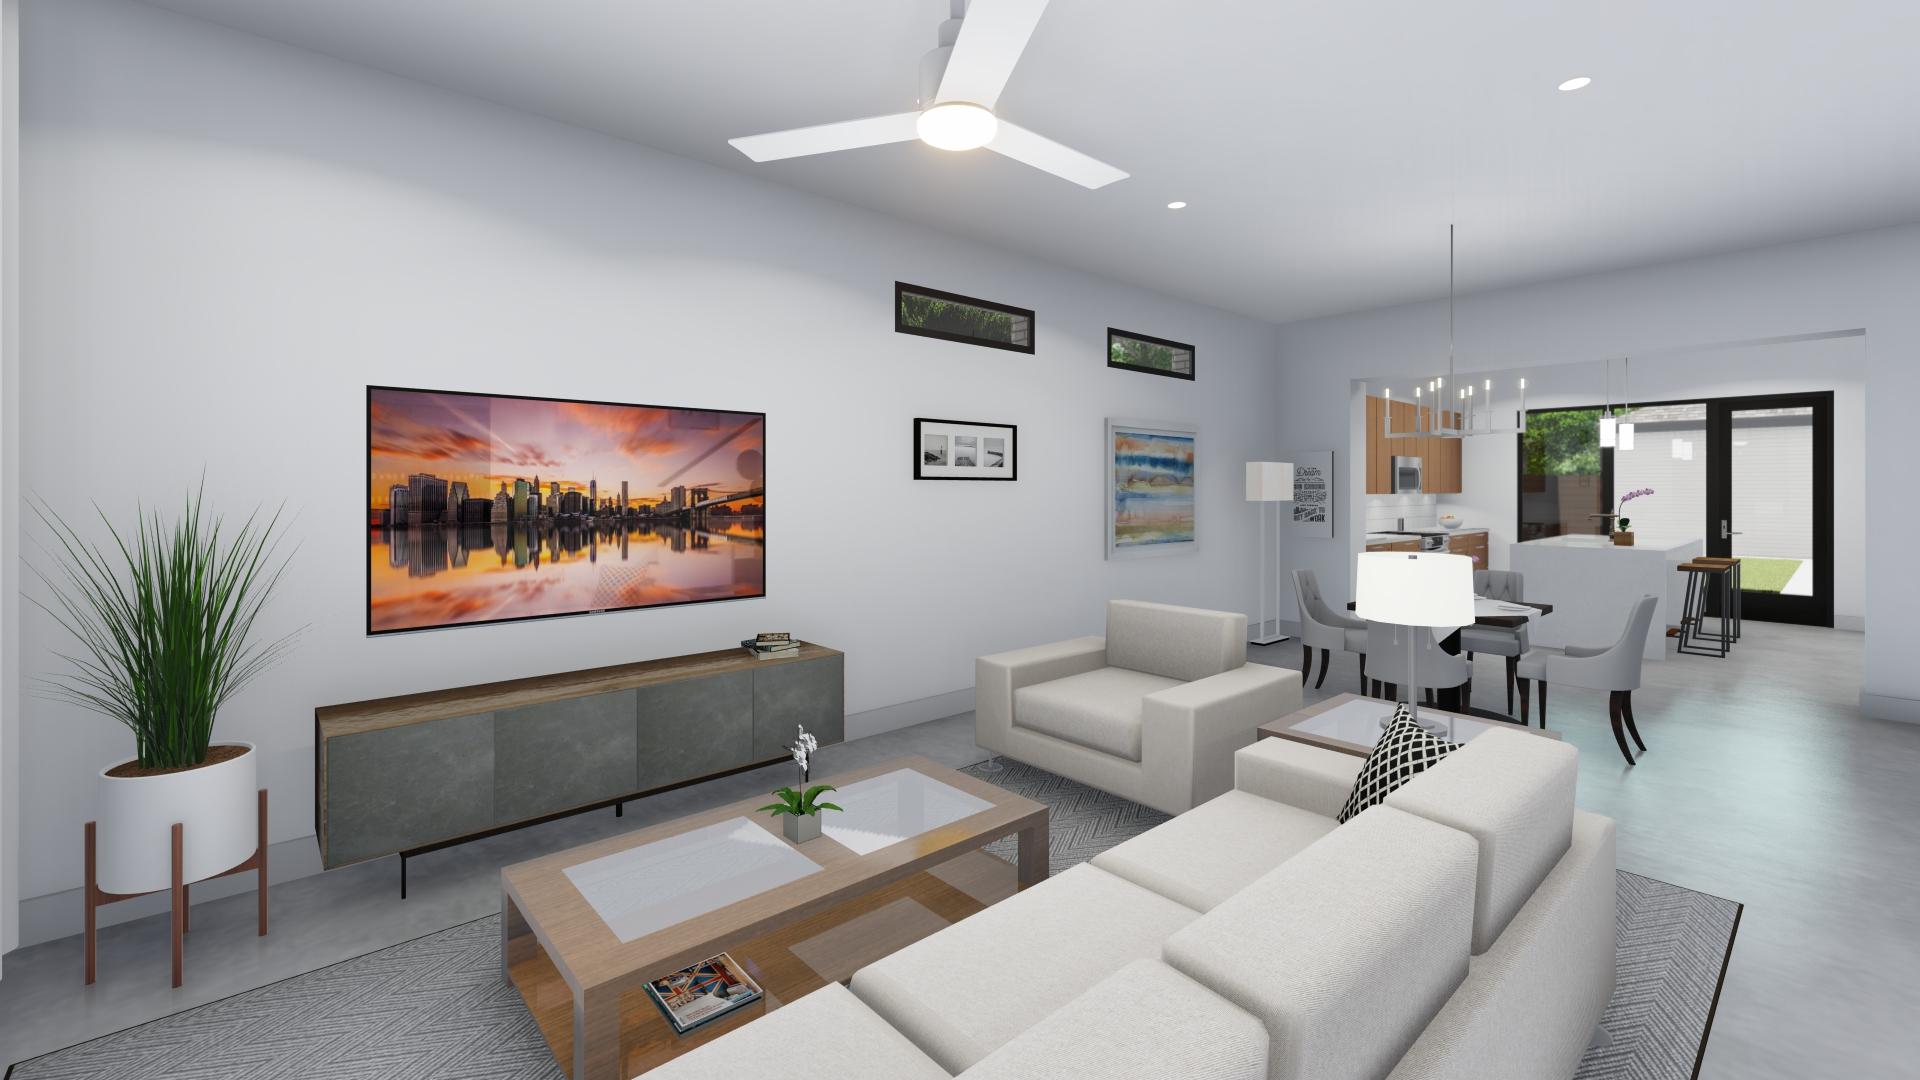 New Wayside interior rendering_Photo - 4.jpg